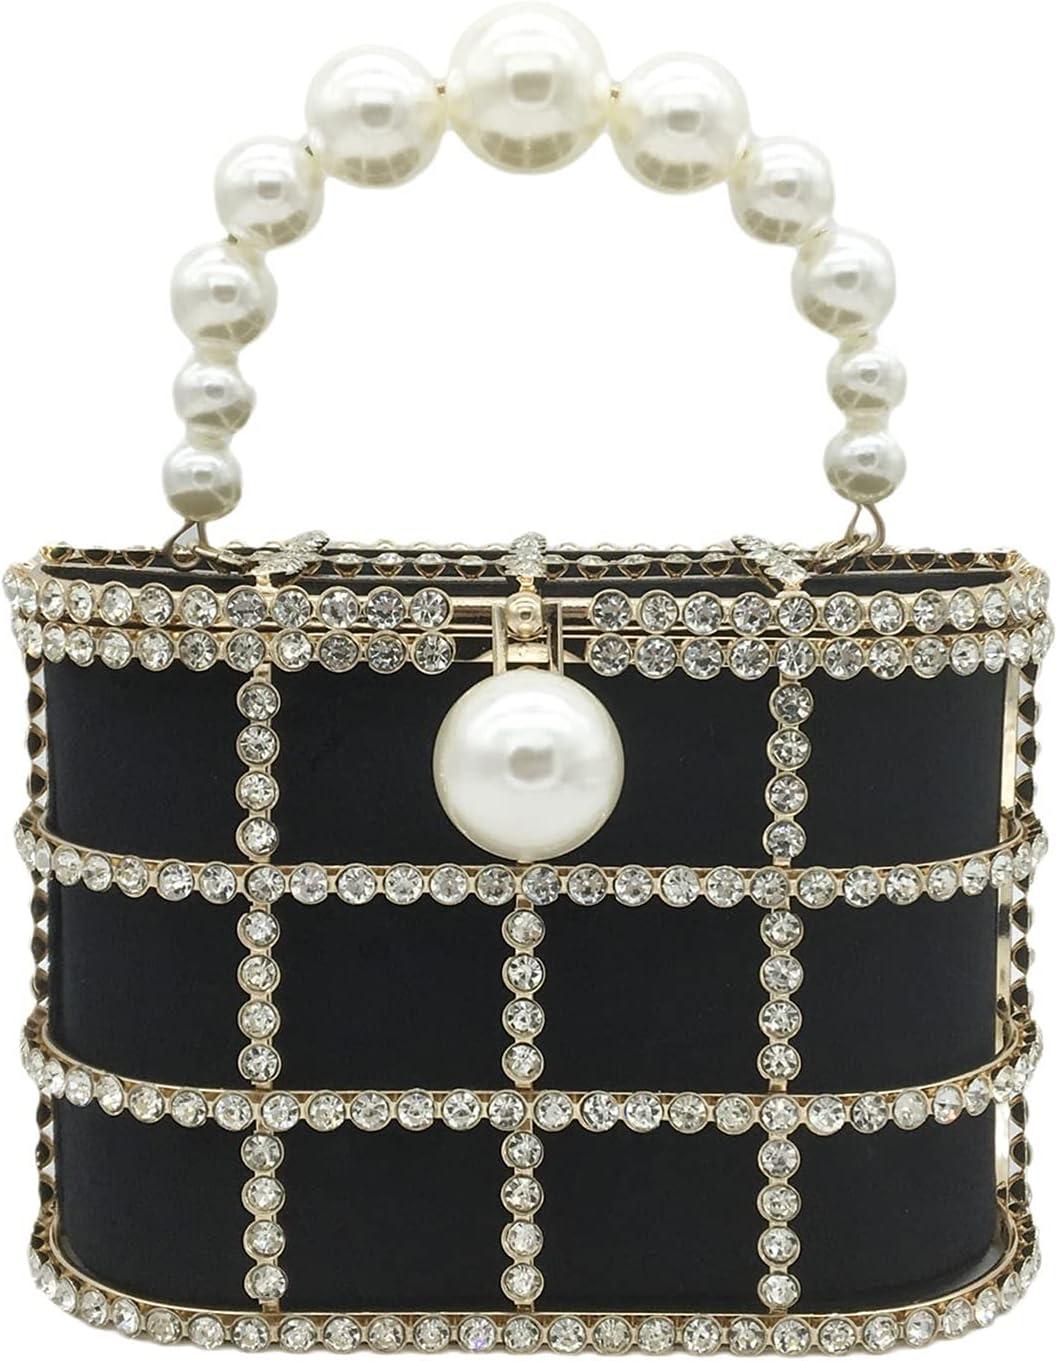 Evening Clutch Bag Evening Bags Diamonds Basket Clutch Bag Women Luxury Pearl Beaded Handbags Wedding Party Purse (Color : Black, Size : Small)